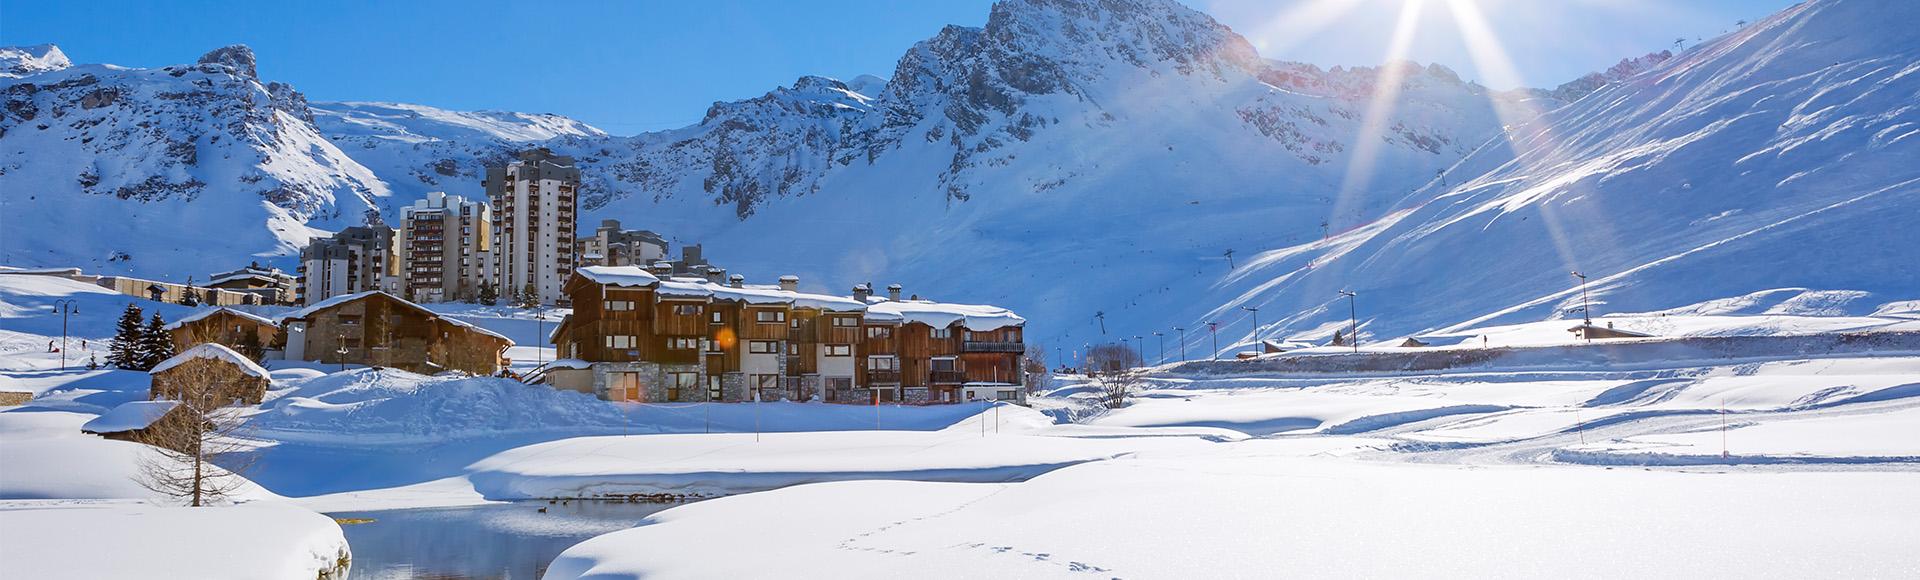 Tignes Frankrike Skidresor Till Alperna Langley